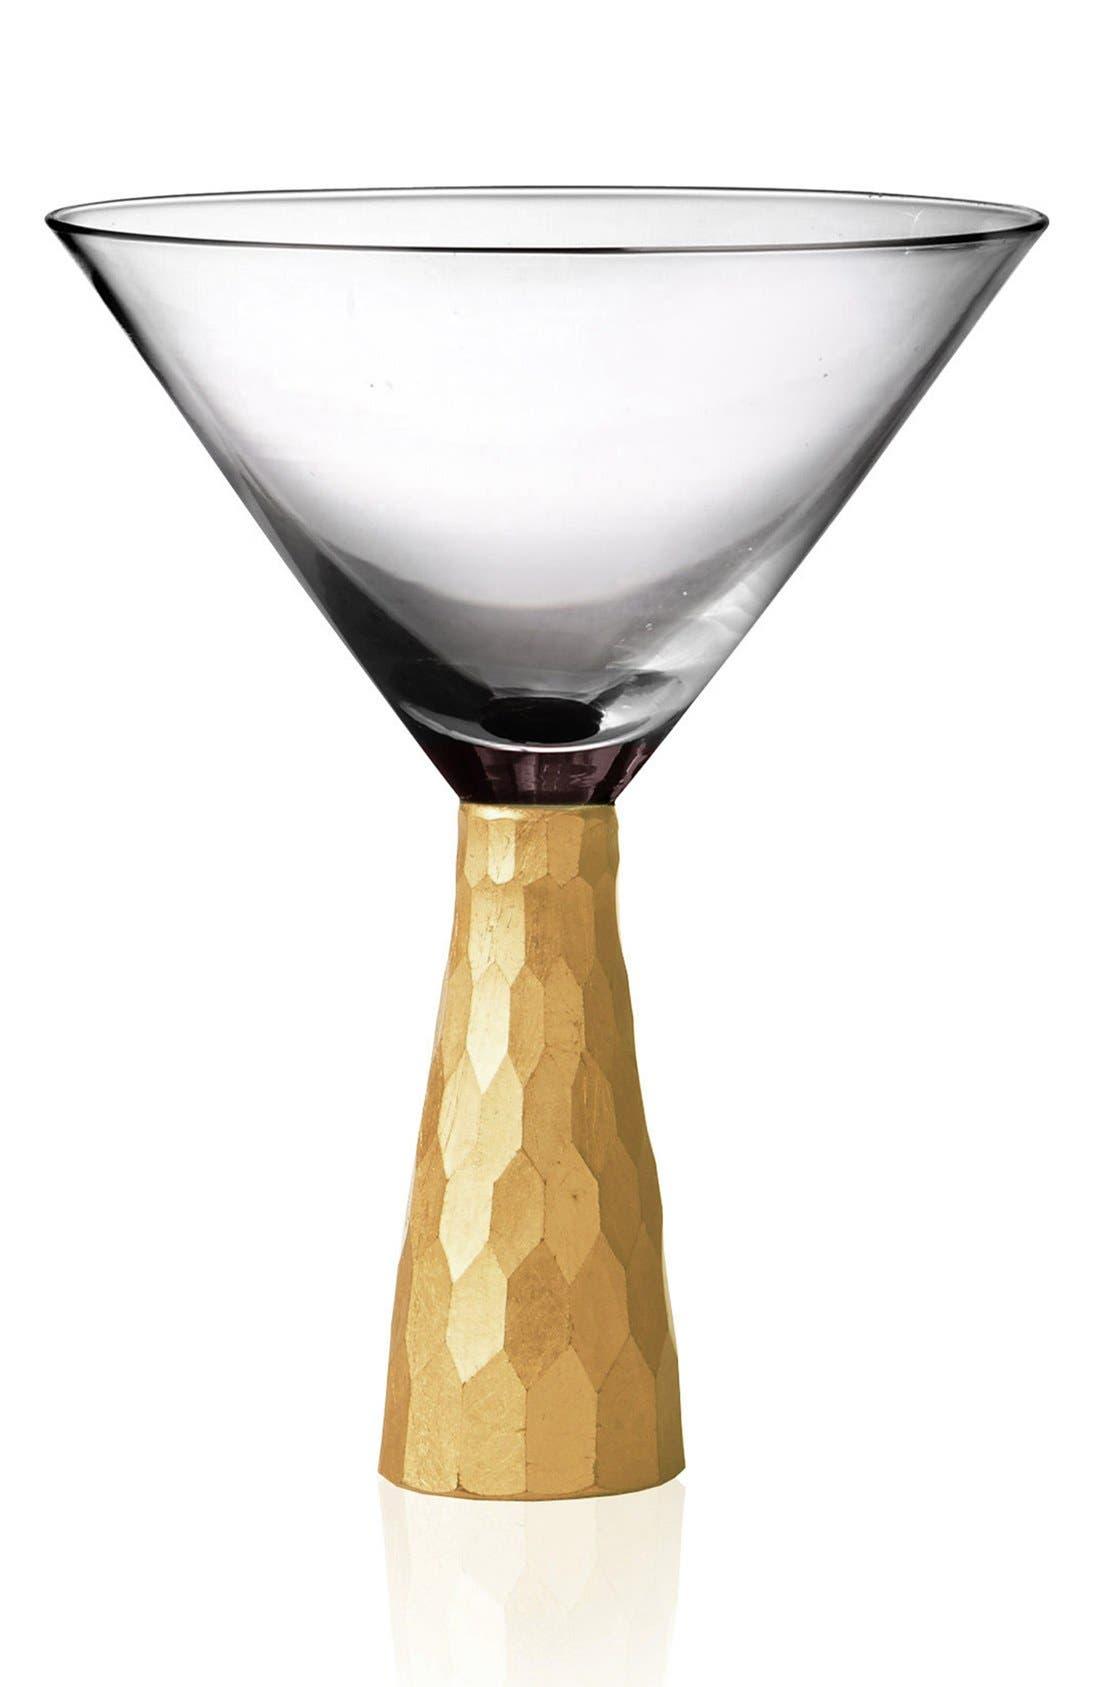 Main Image - American Atelier 'Daphne' Martini Glasses (Set of 4)